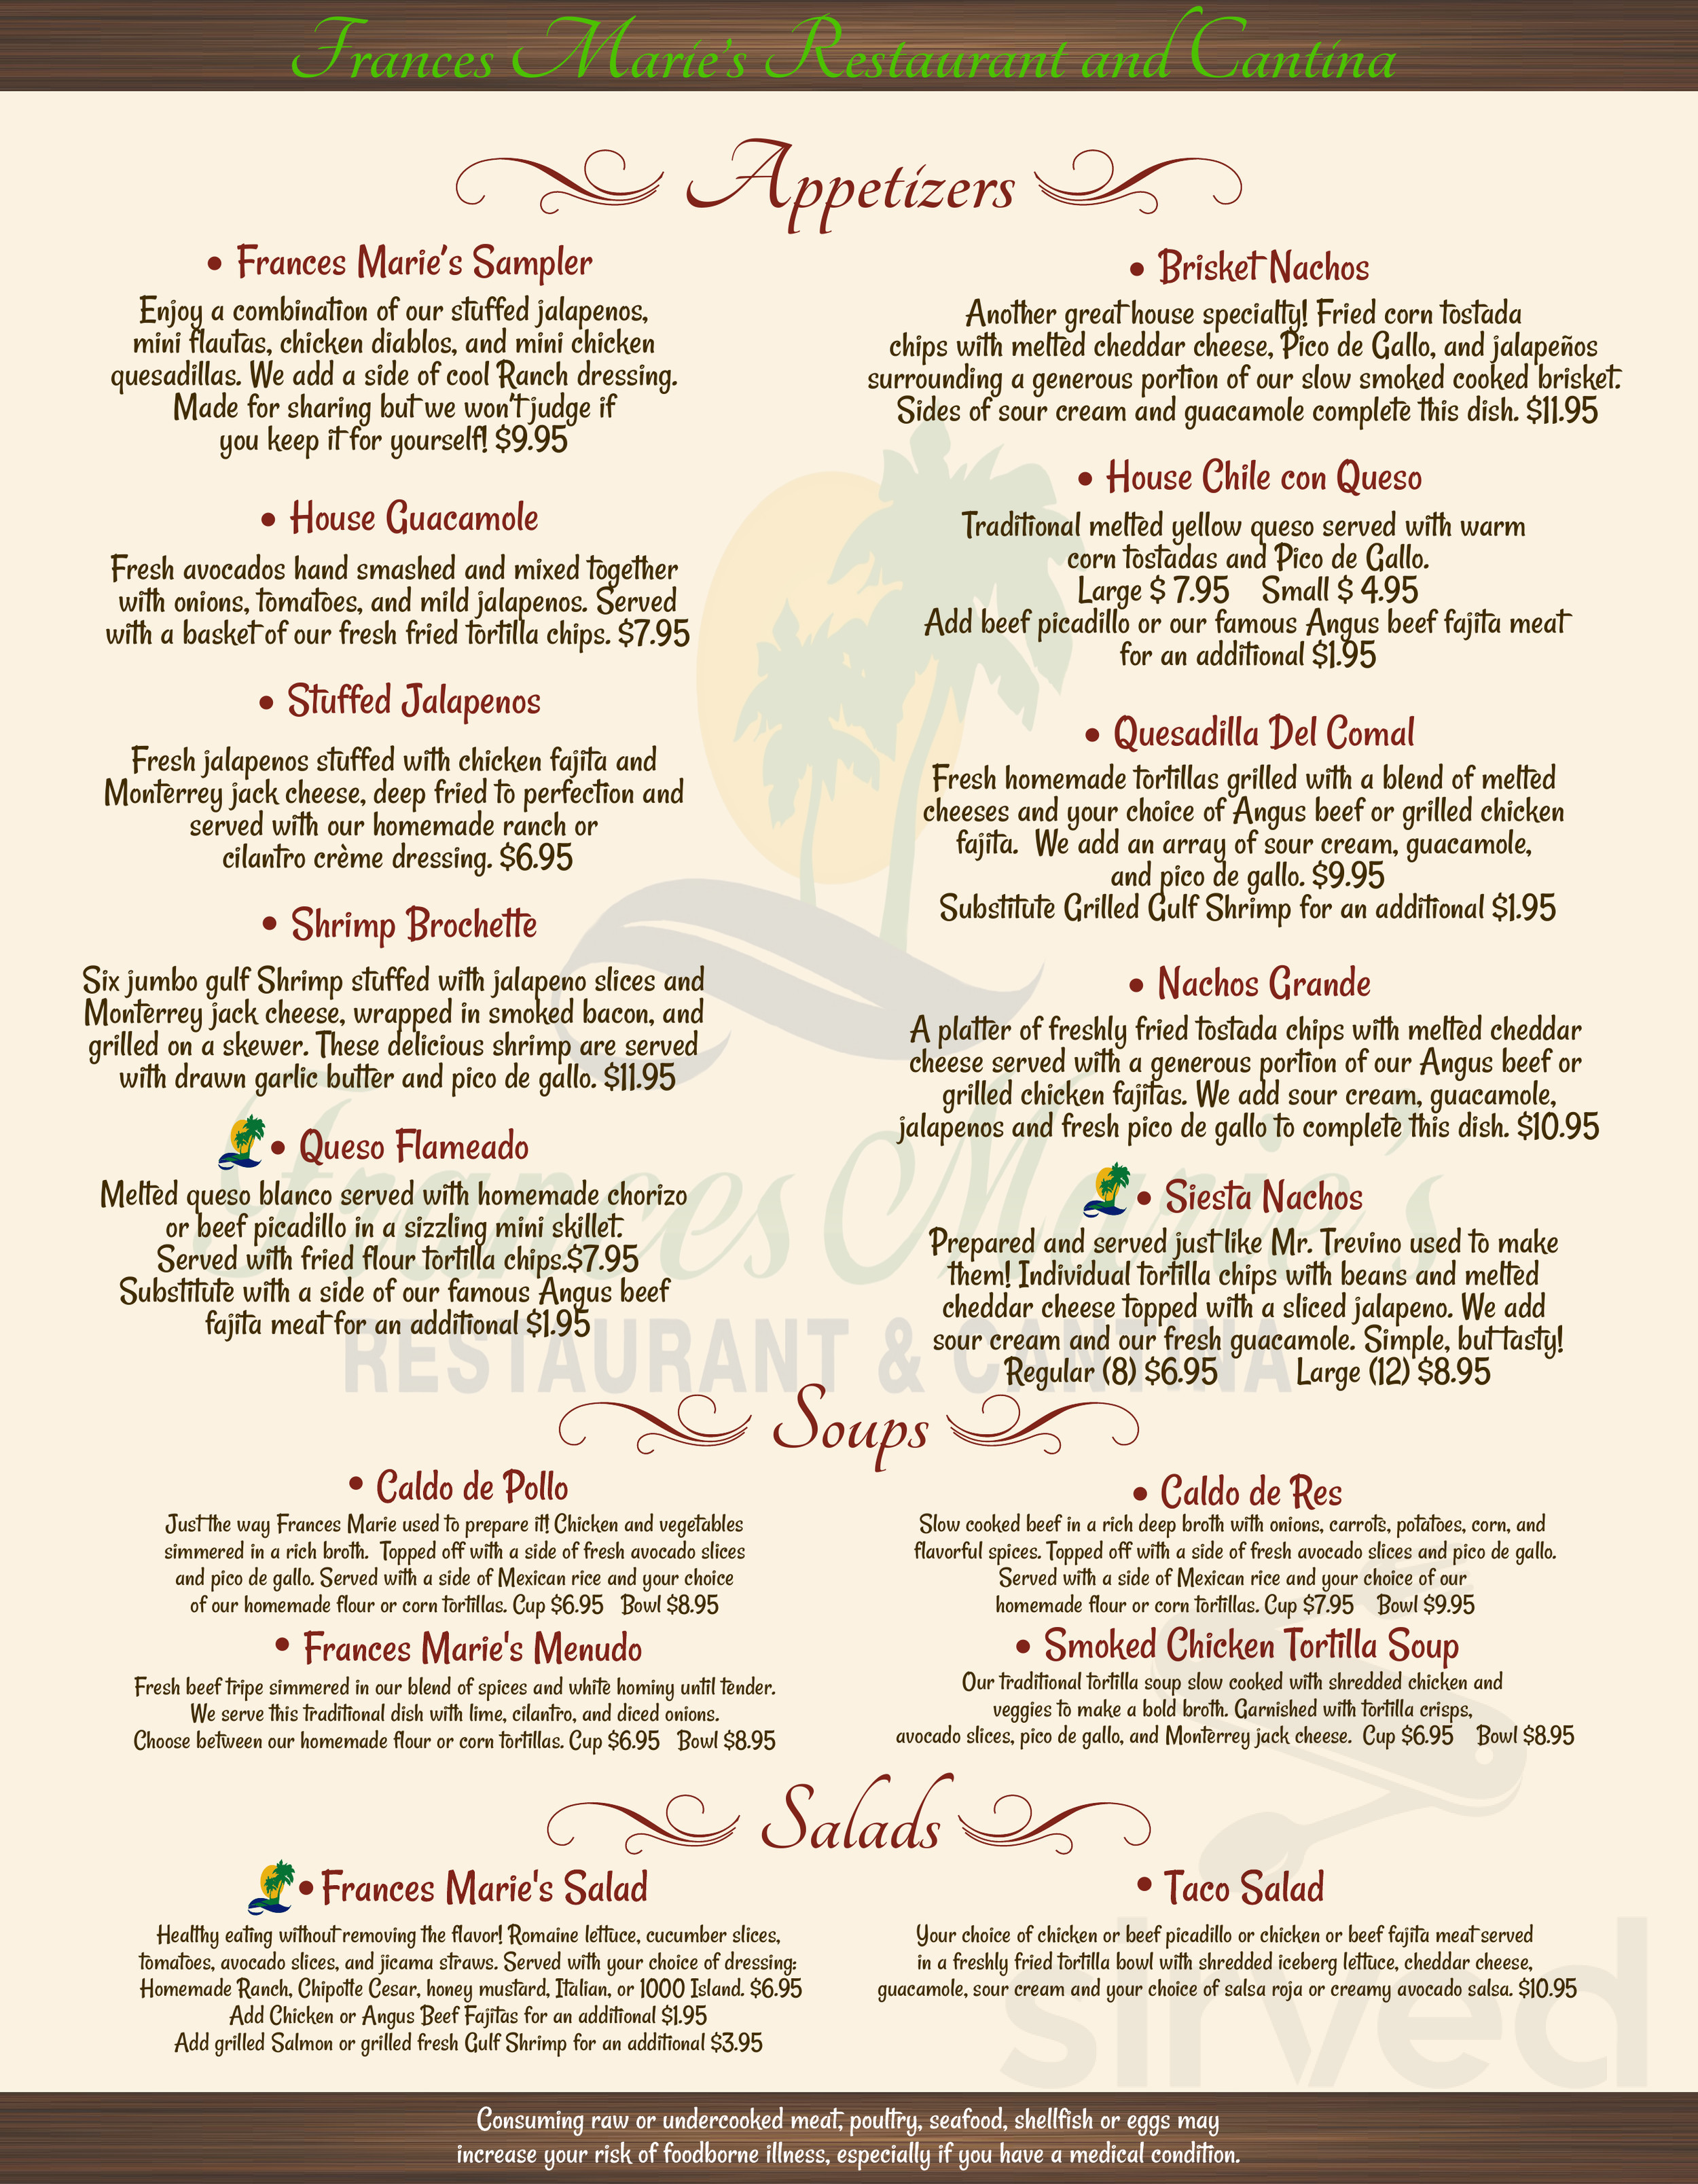 Frances Marie S Restaurant Cantina Menu In Victoria Texas Usa